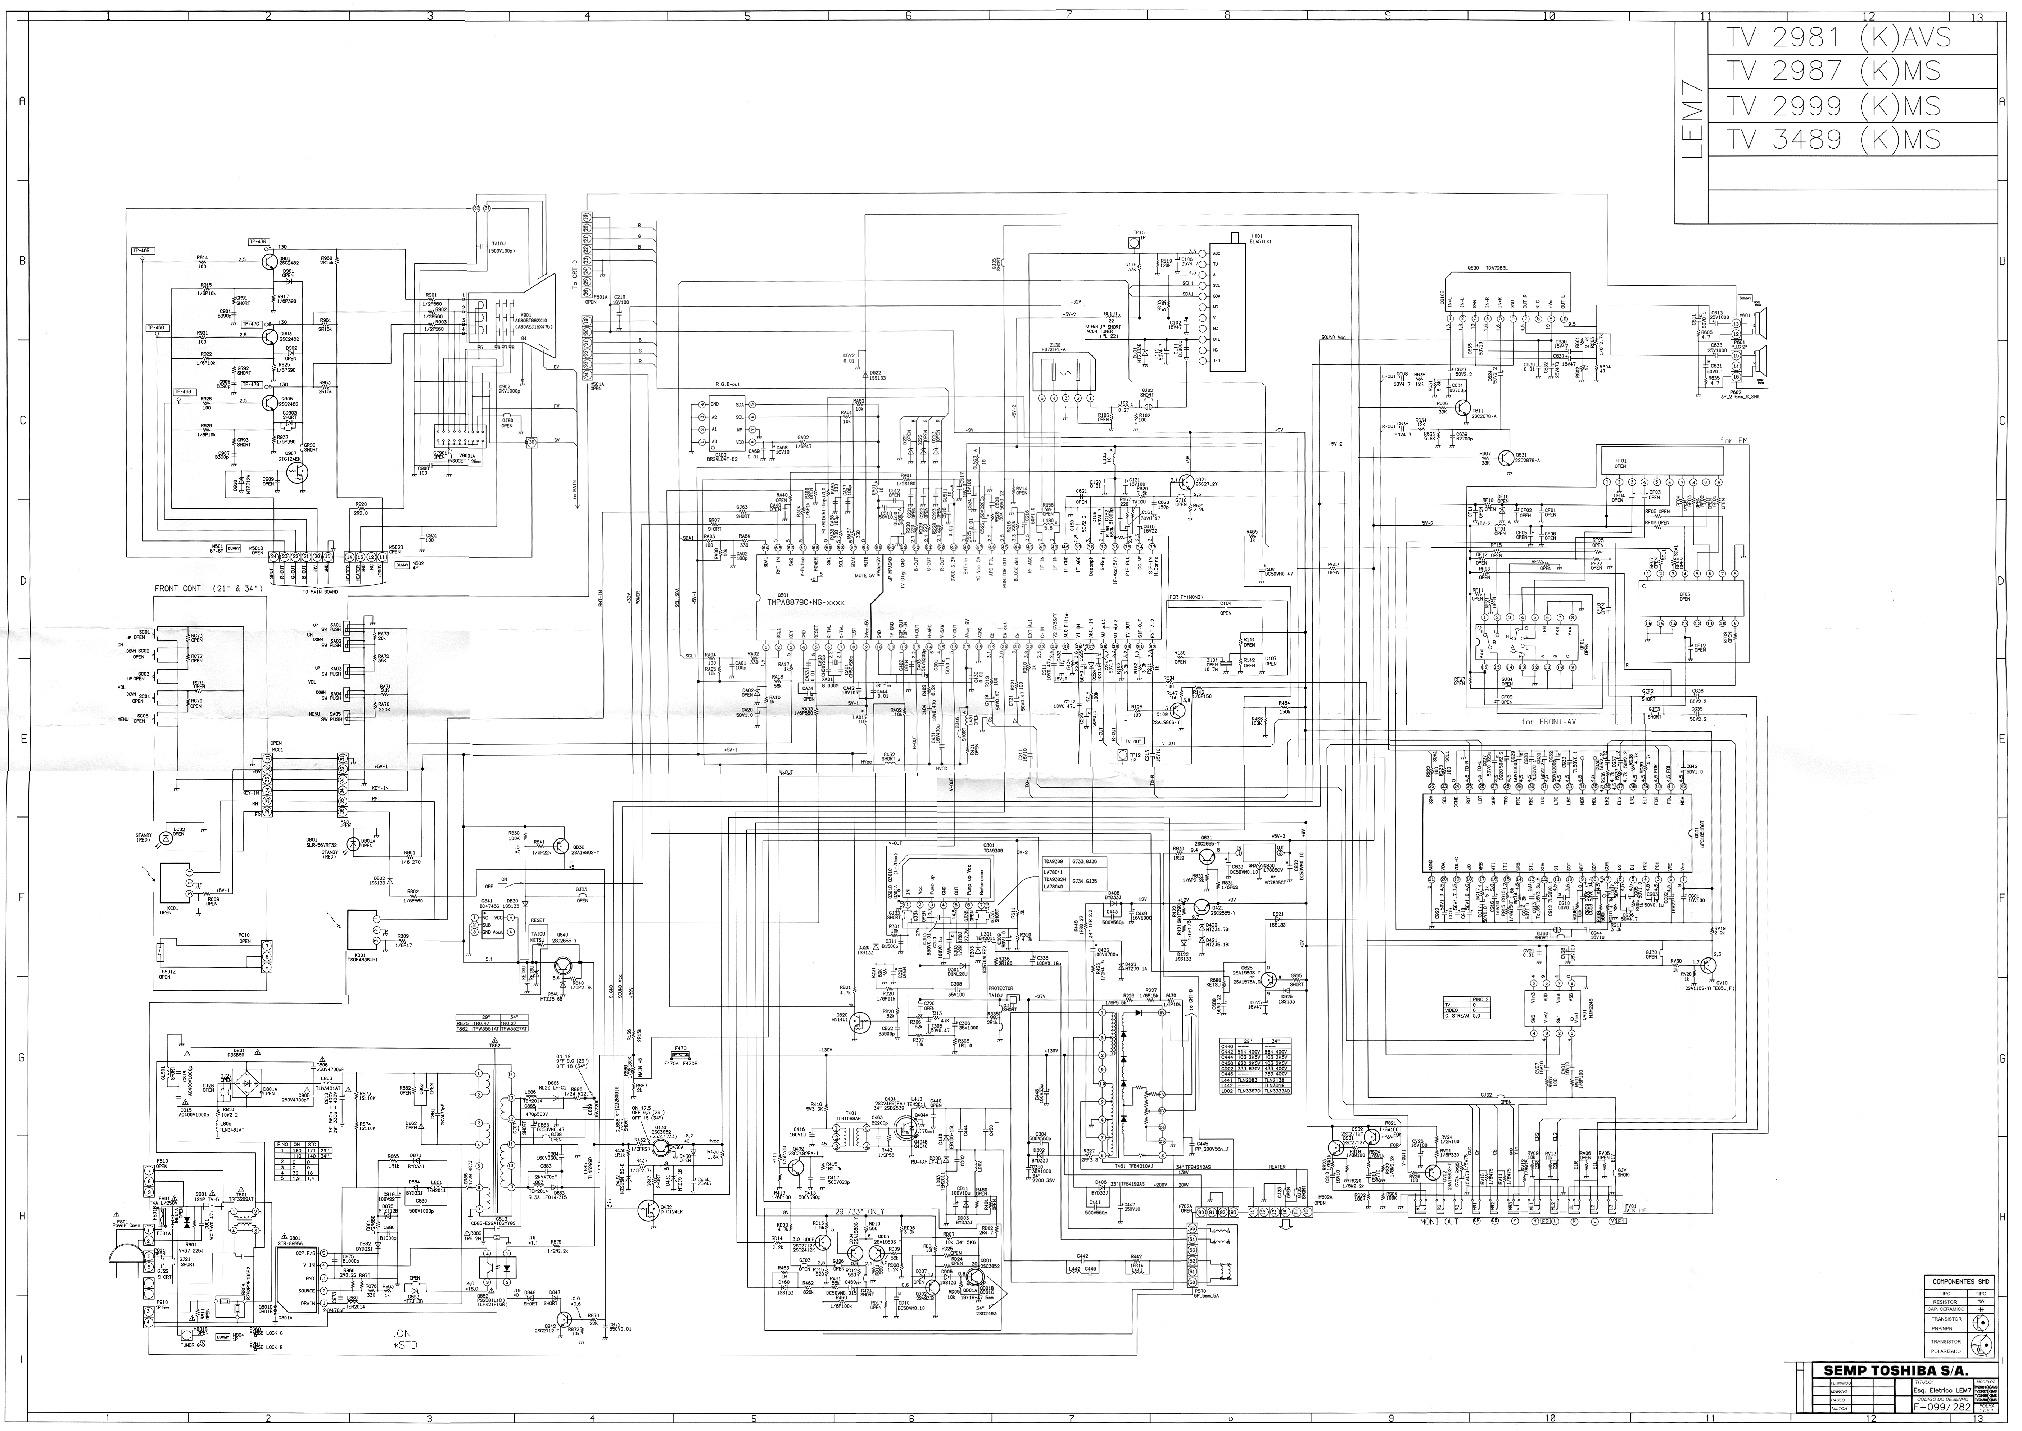 Toshiba Toshiba LEM7 pdf Diagramas de Televisores Lcd y